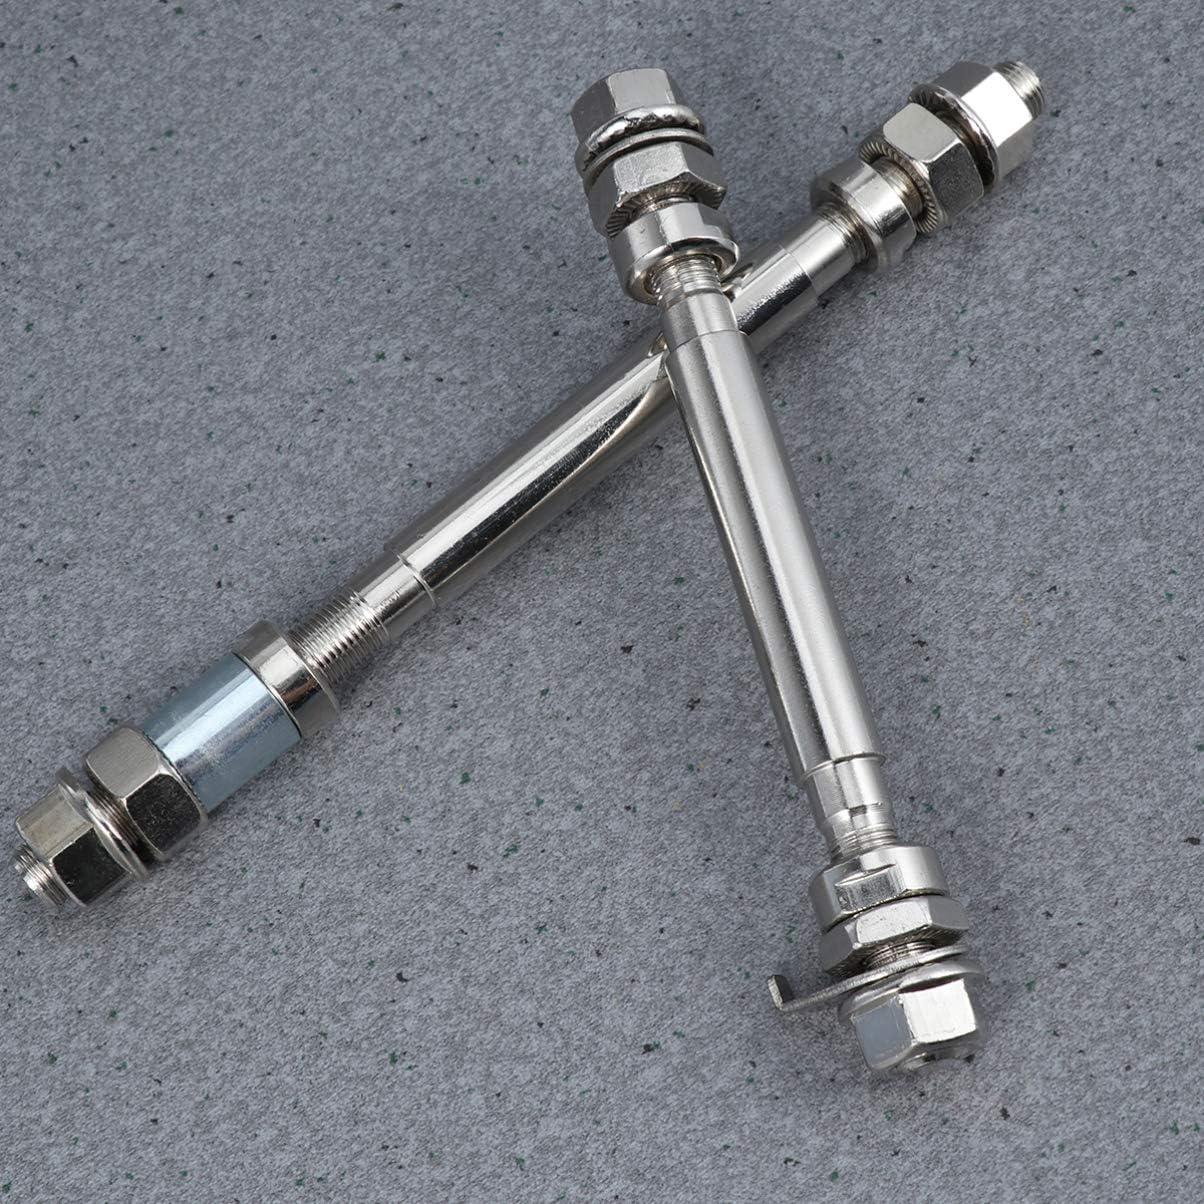 BESPORTBLE 2Pcs Bike Wheel Hub Axle Non Quick Release Lock Skewers Set For Front Rear Bike Repair Tool Silver